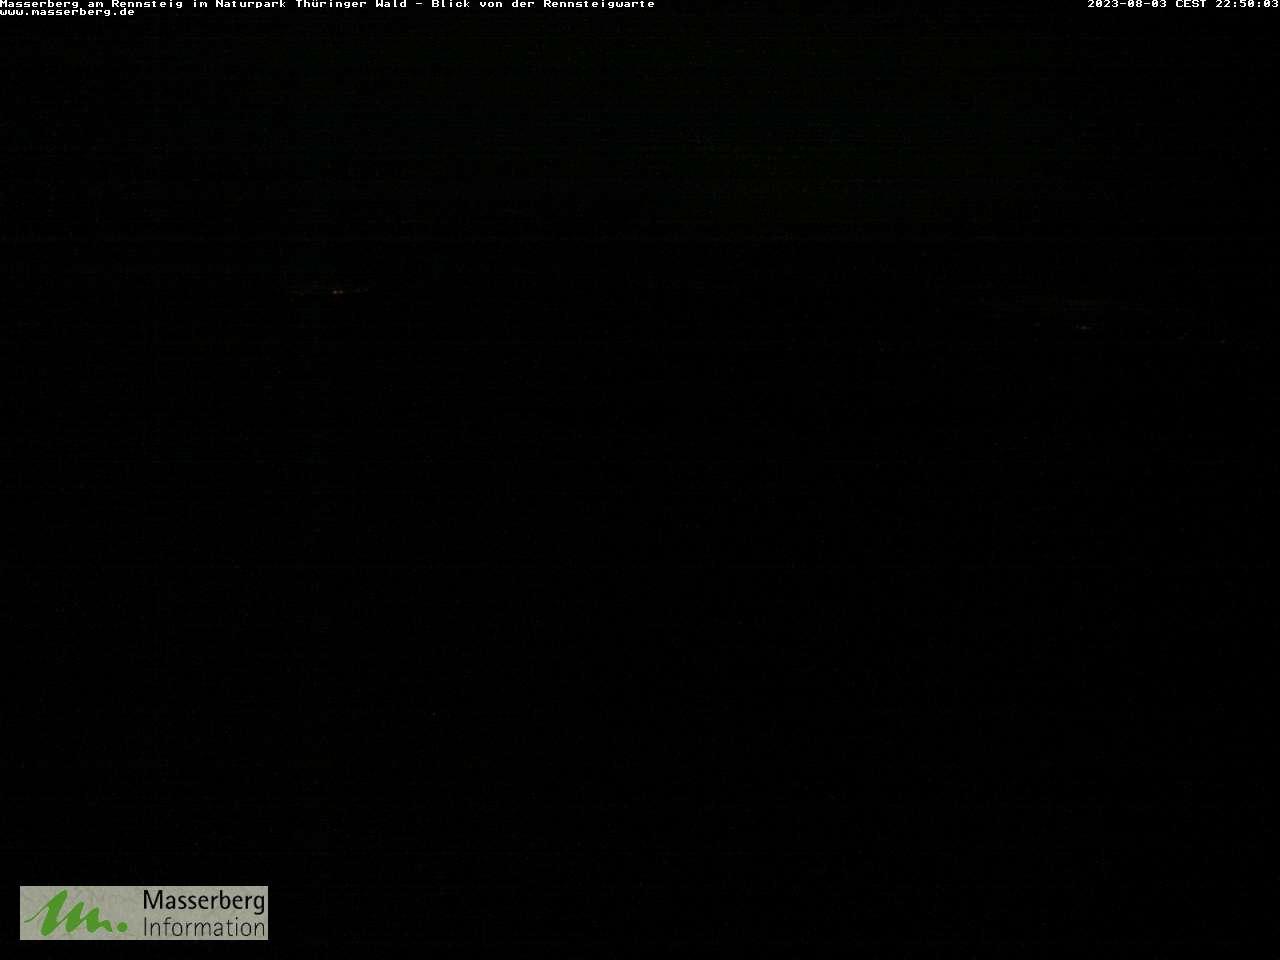 Webcam Skigebiet Masserberg - Skiarena Heubach Rennsteig - Thüringer Wald